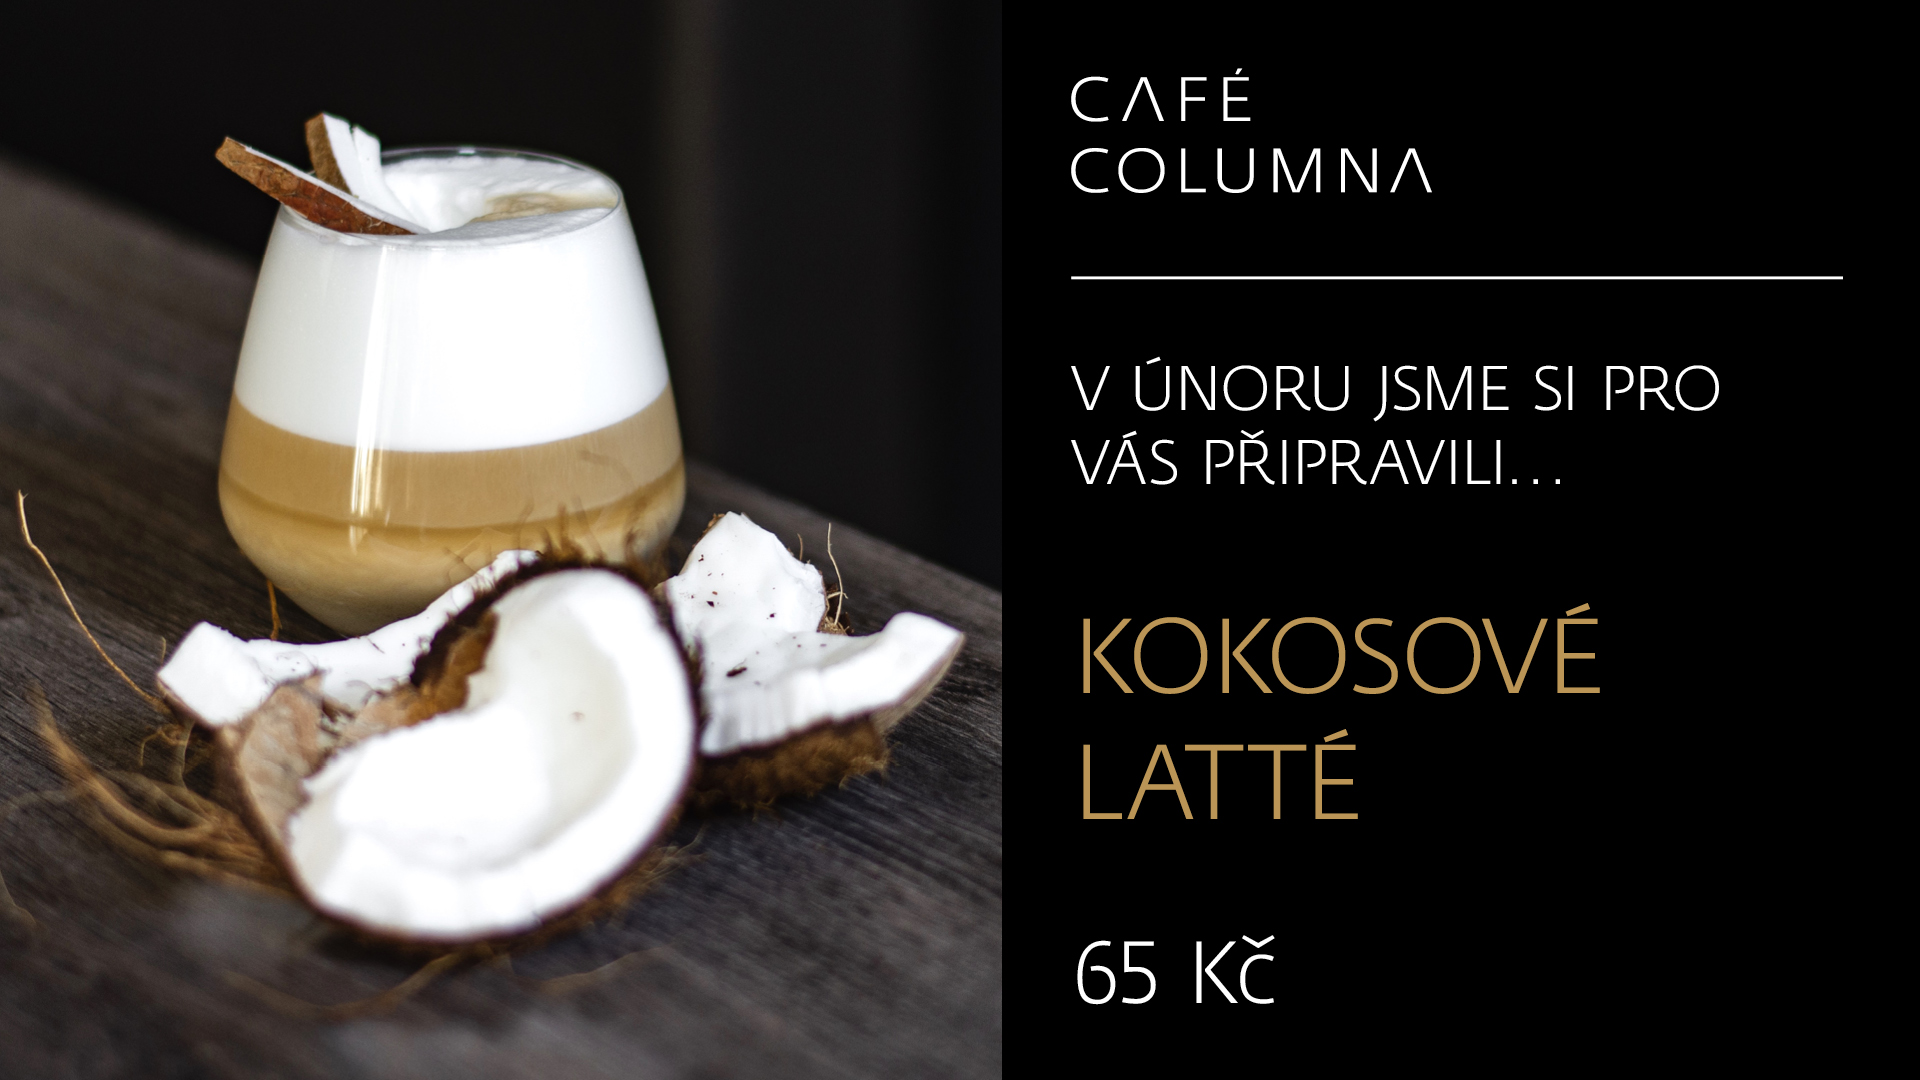 Café_Columna_LCD_1920x1080px_Kokosove_latte